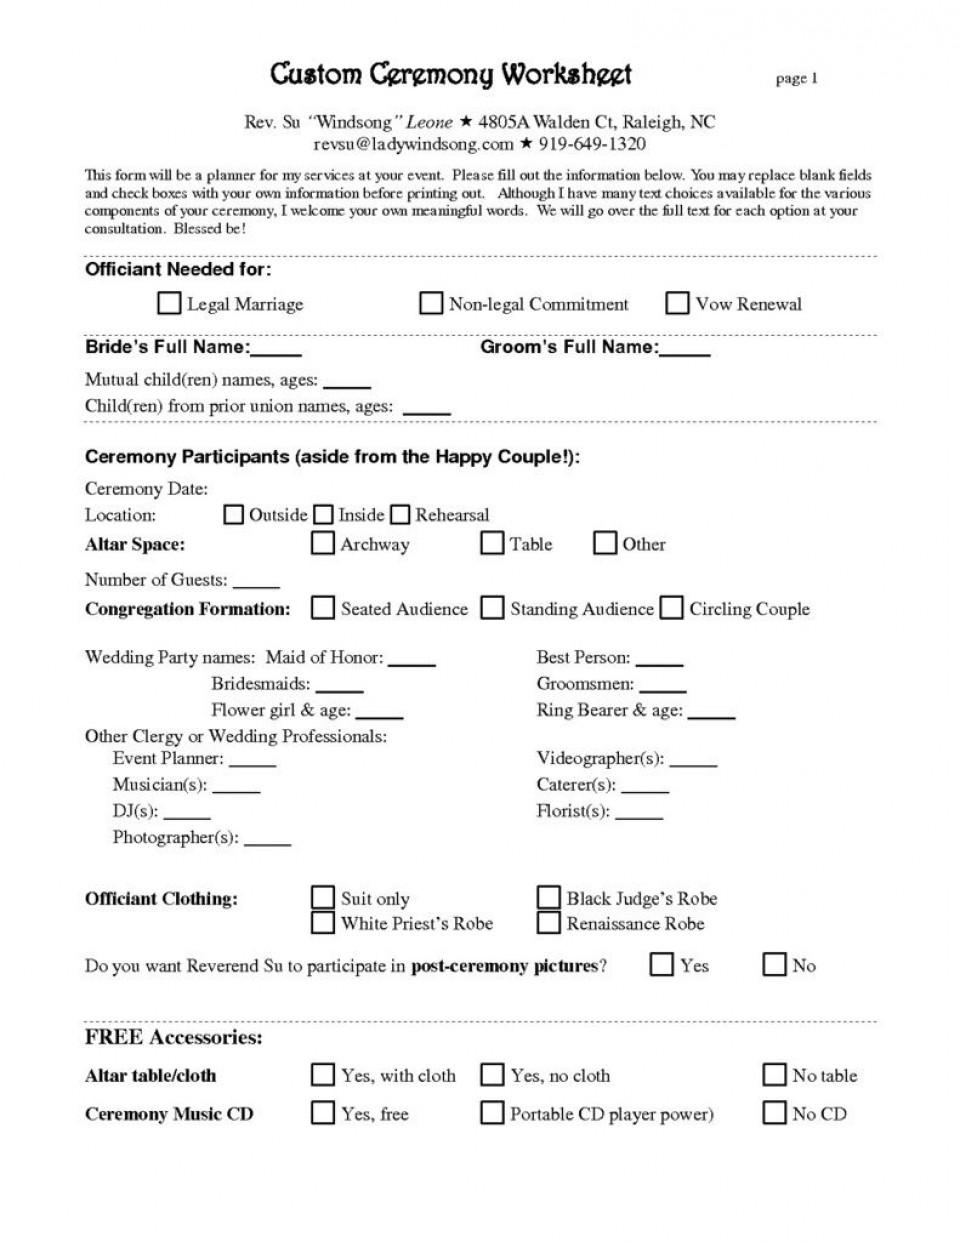 008 Amazing Wedding Planner Contract Template Concept  Uk Australia960